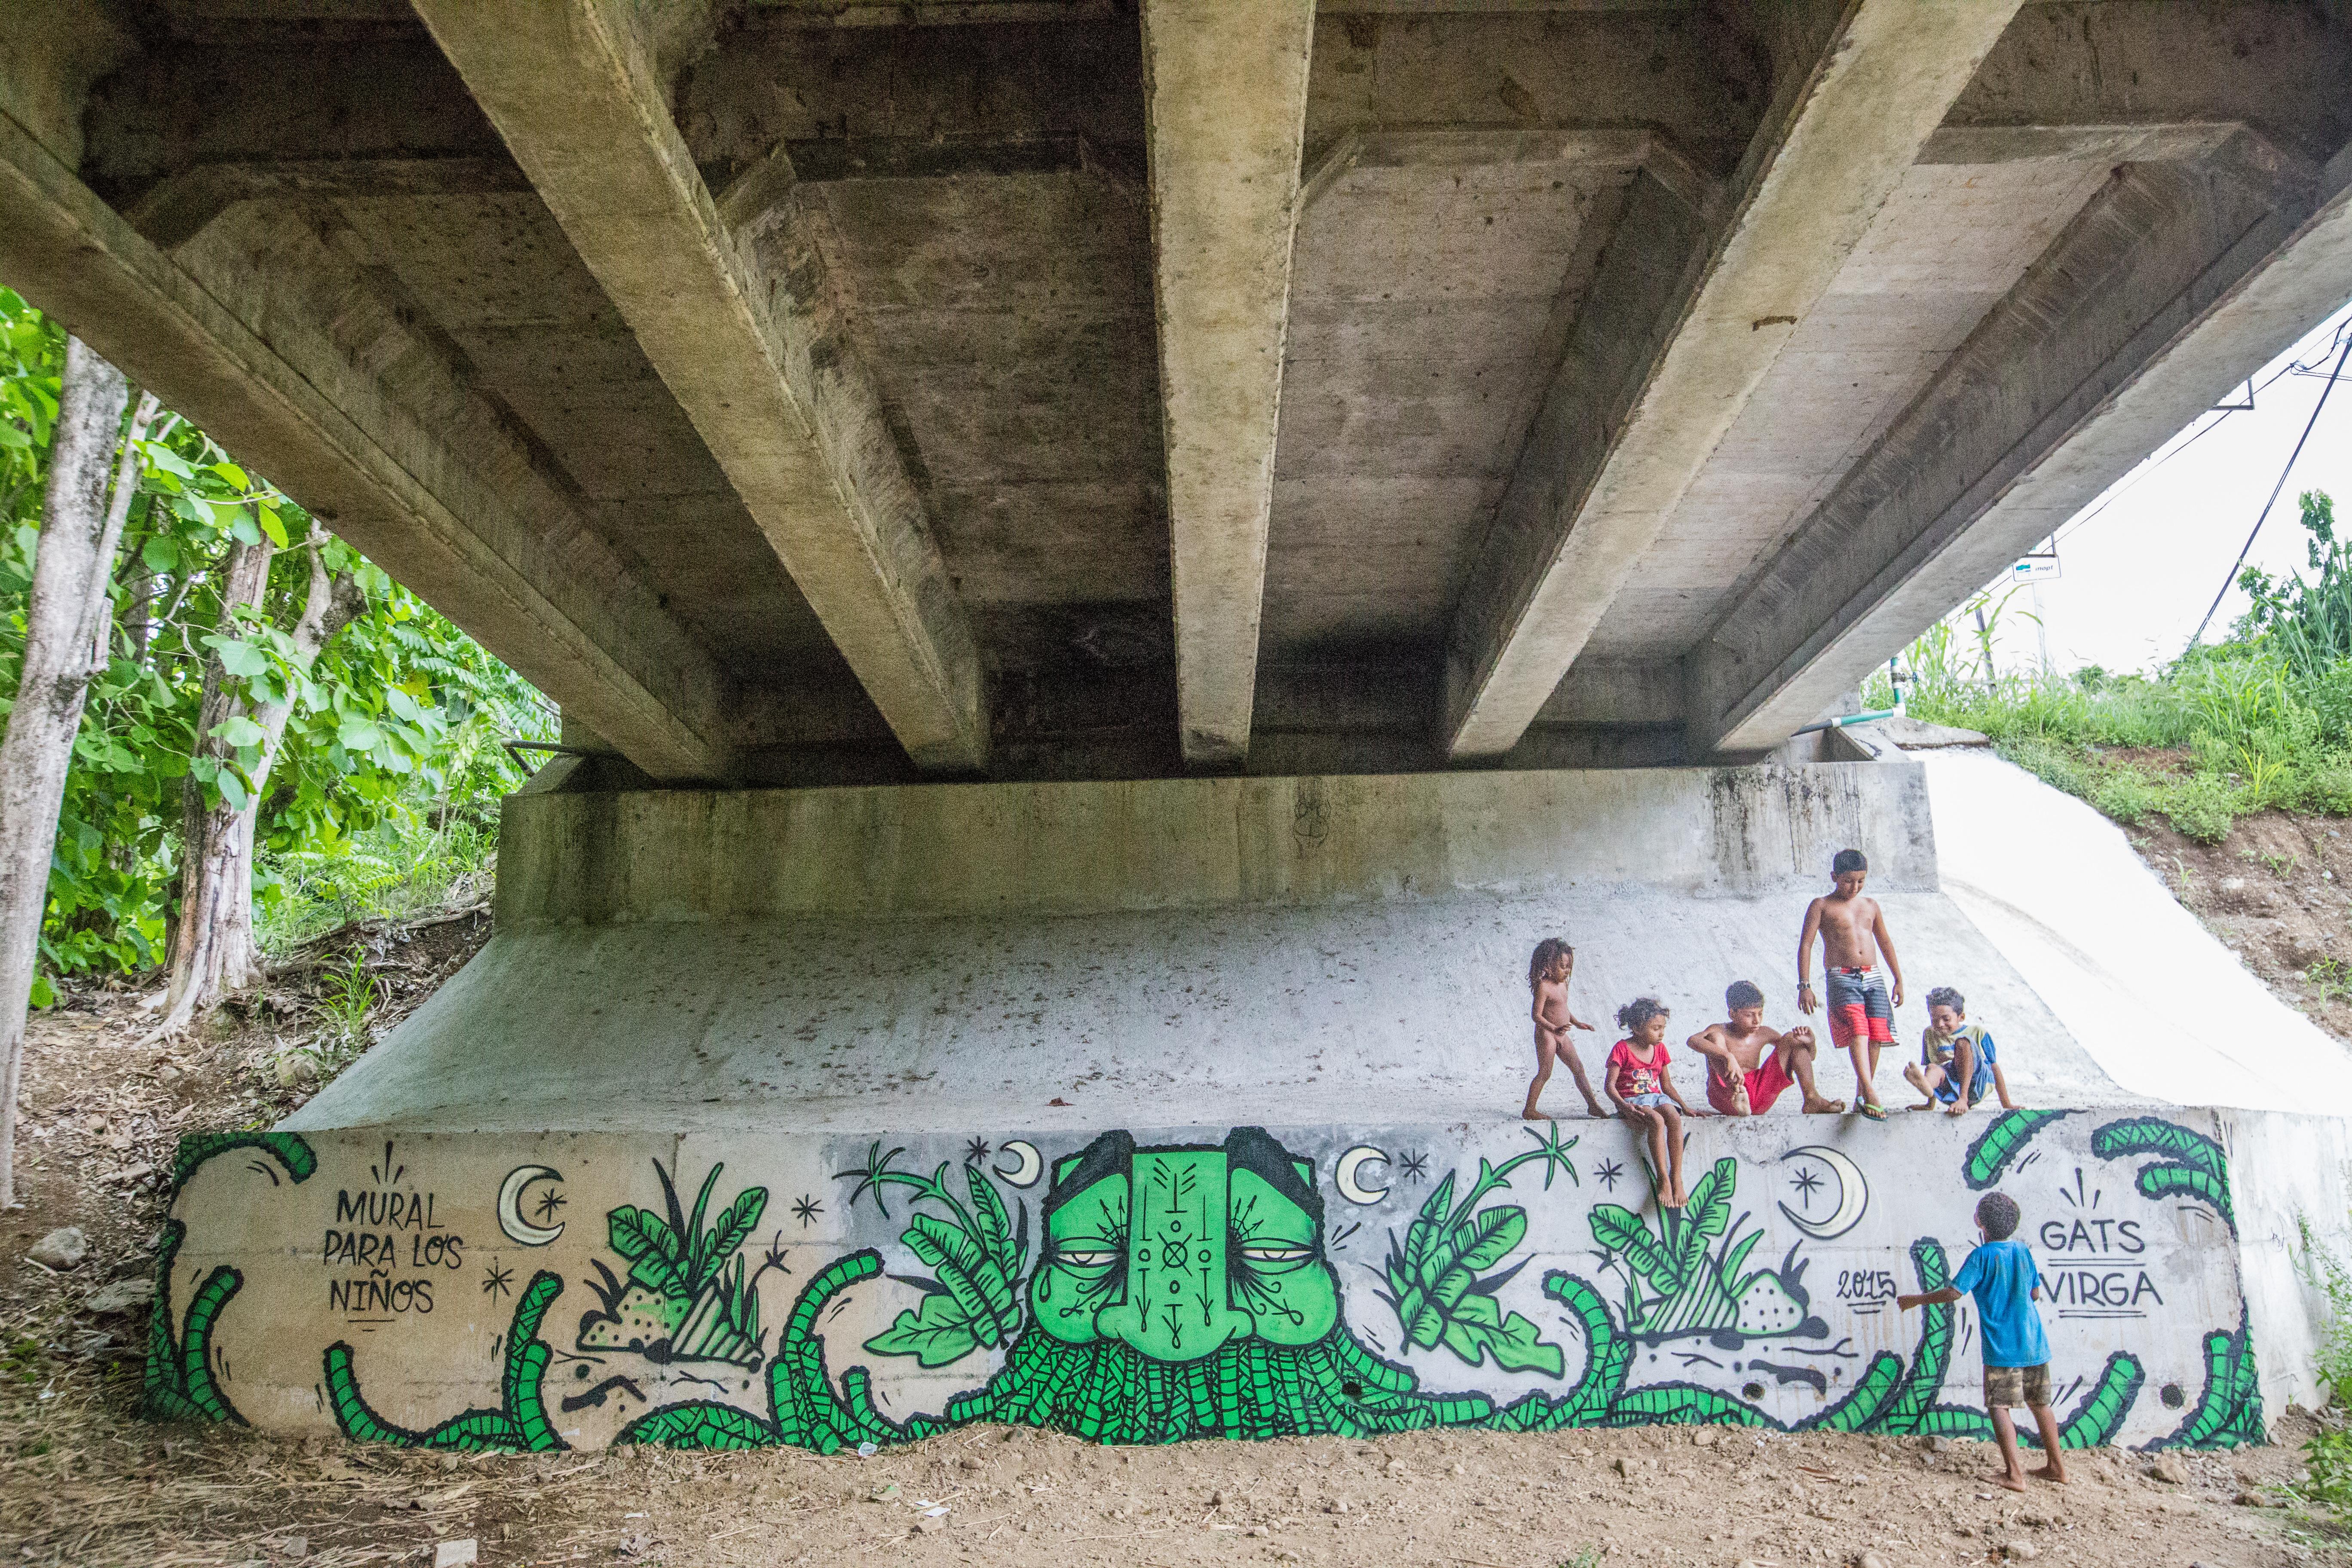 "GAT & Virga - ""Mural Para Los Ninos"""